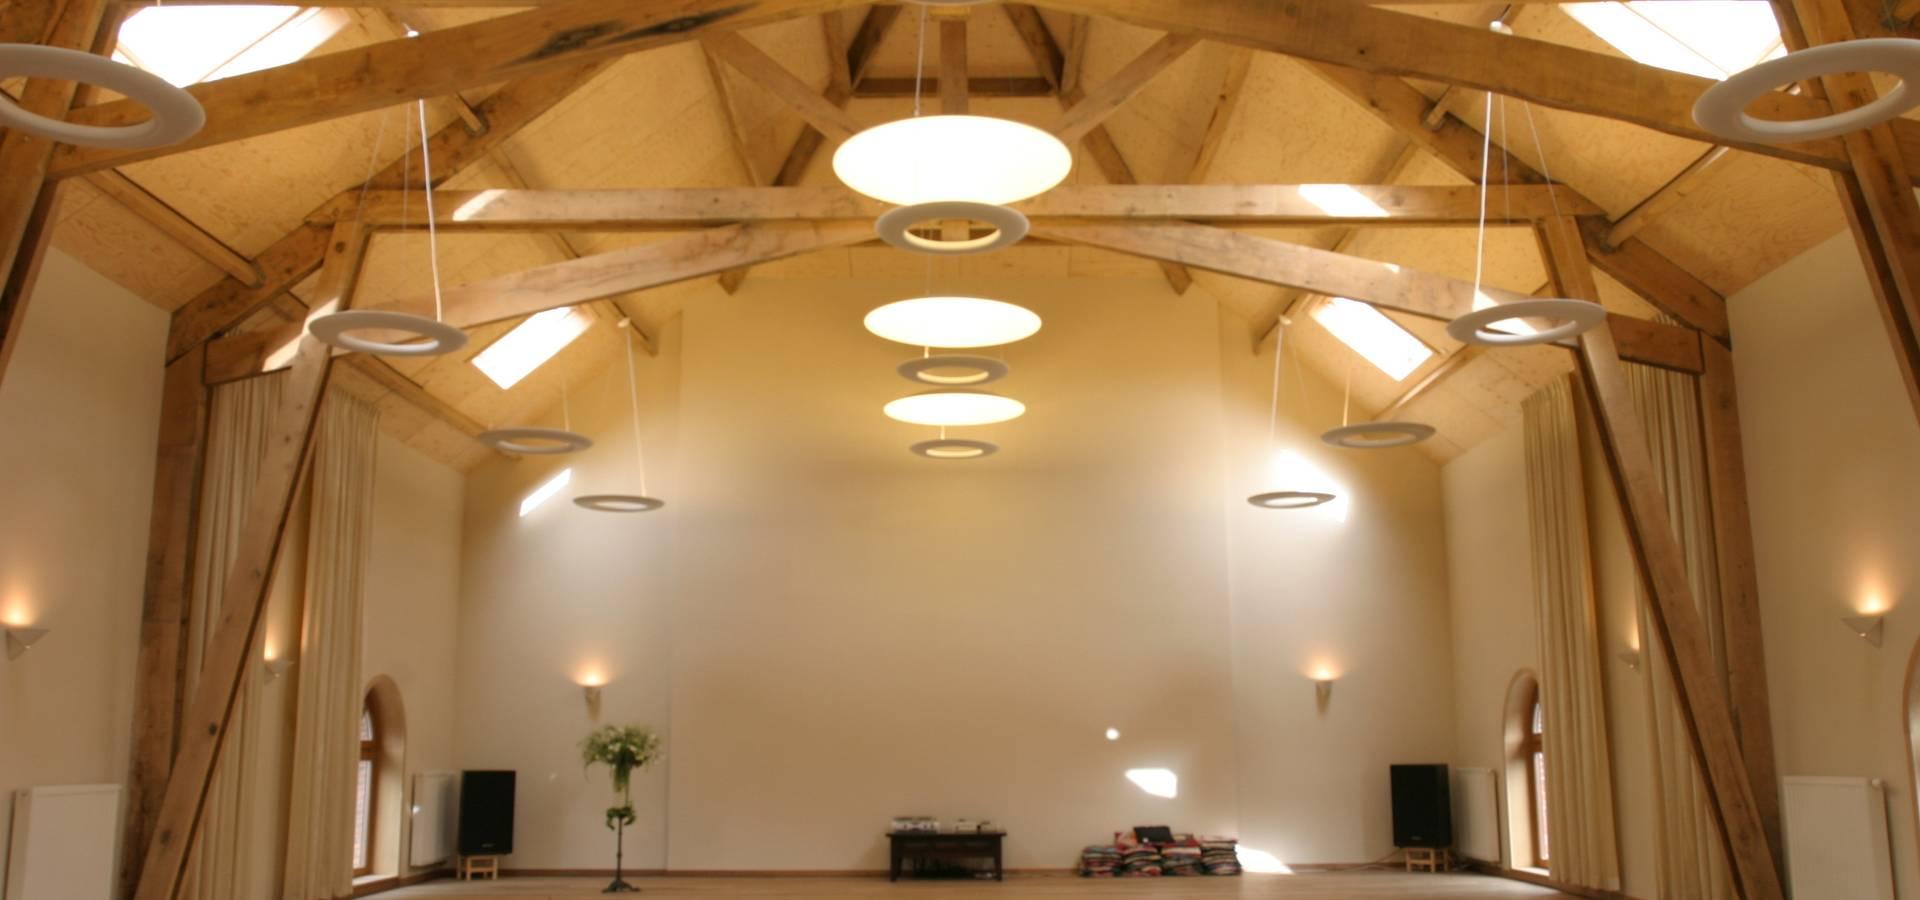 Architectenbureau Van Hunnik, Lambrechts en Overduin